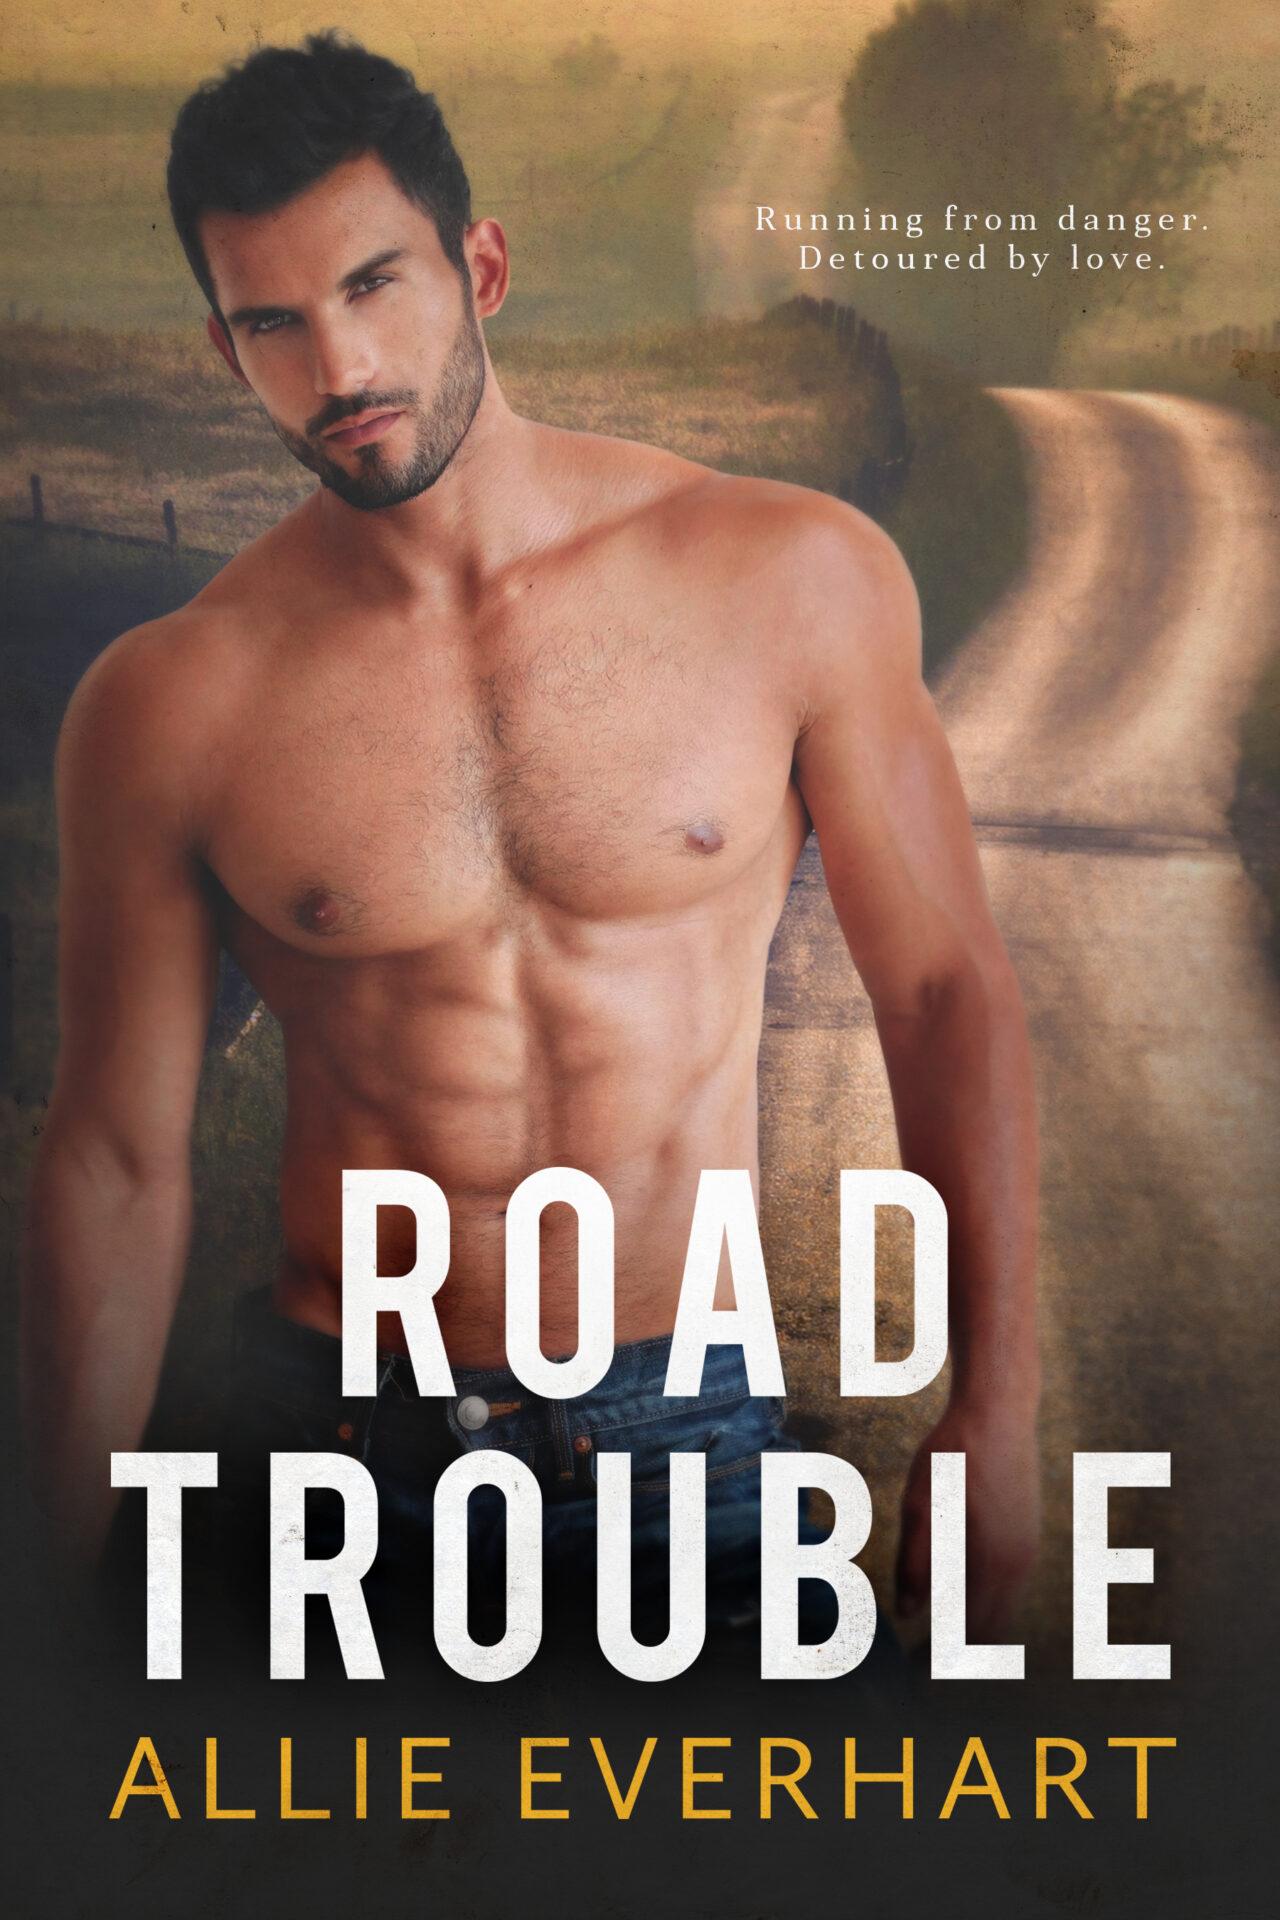 Road Trouble is a romantic suspense novel by Allie Everhart.